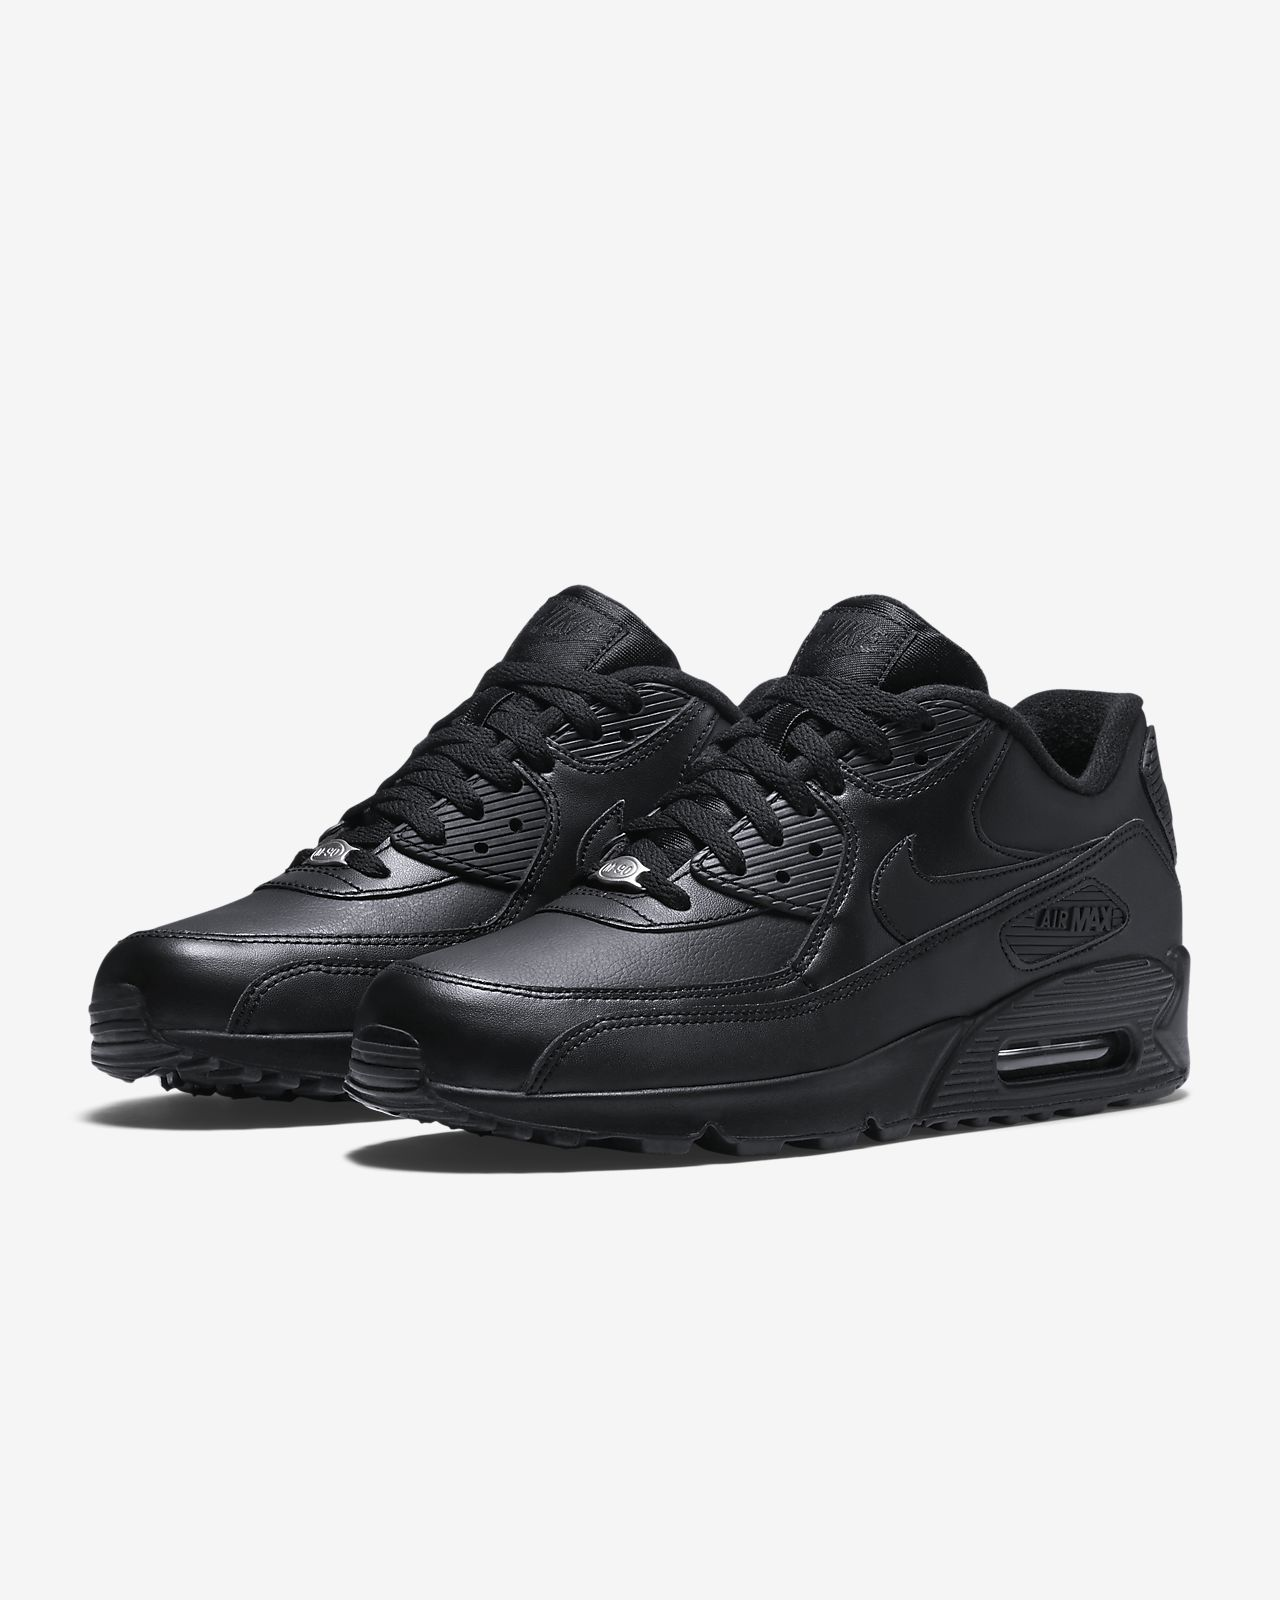 zapatillas casual de hombre air max 90 leather nike